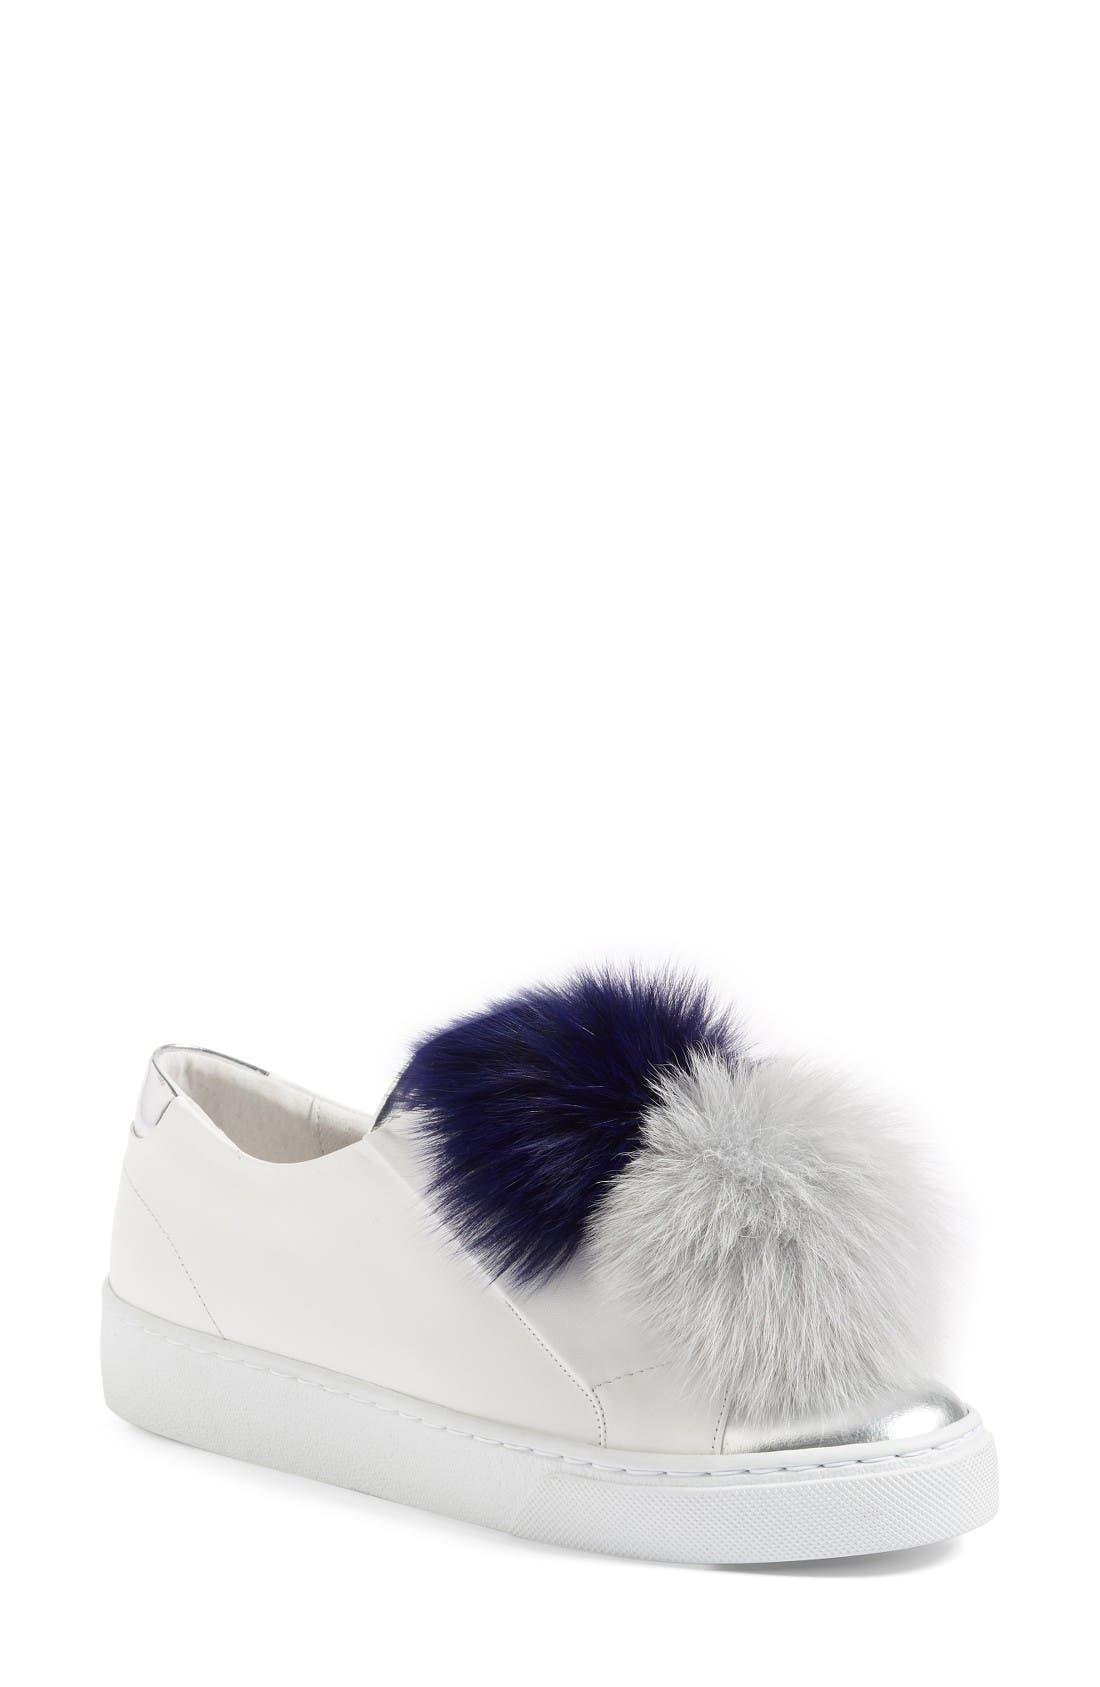 Arian Genuine Fox Fur Trim Sneaker,                             Main thumbnail 1, color,                             White Leather/ Navy/ Grey